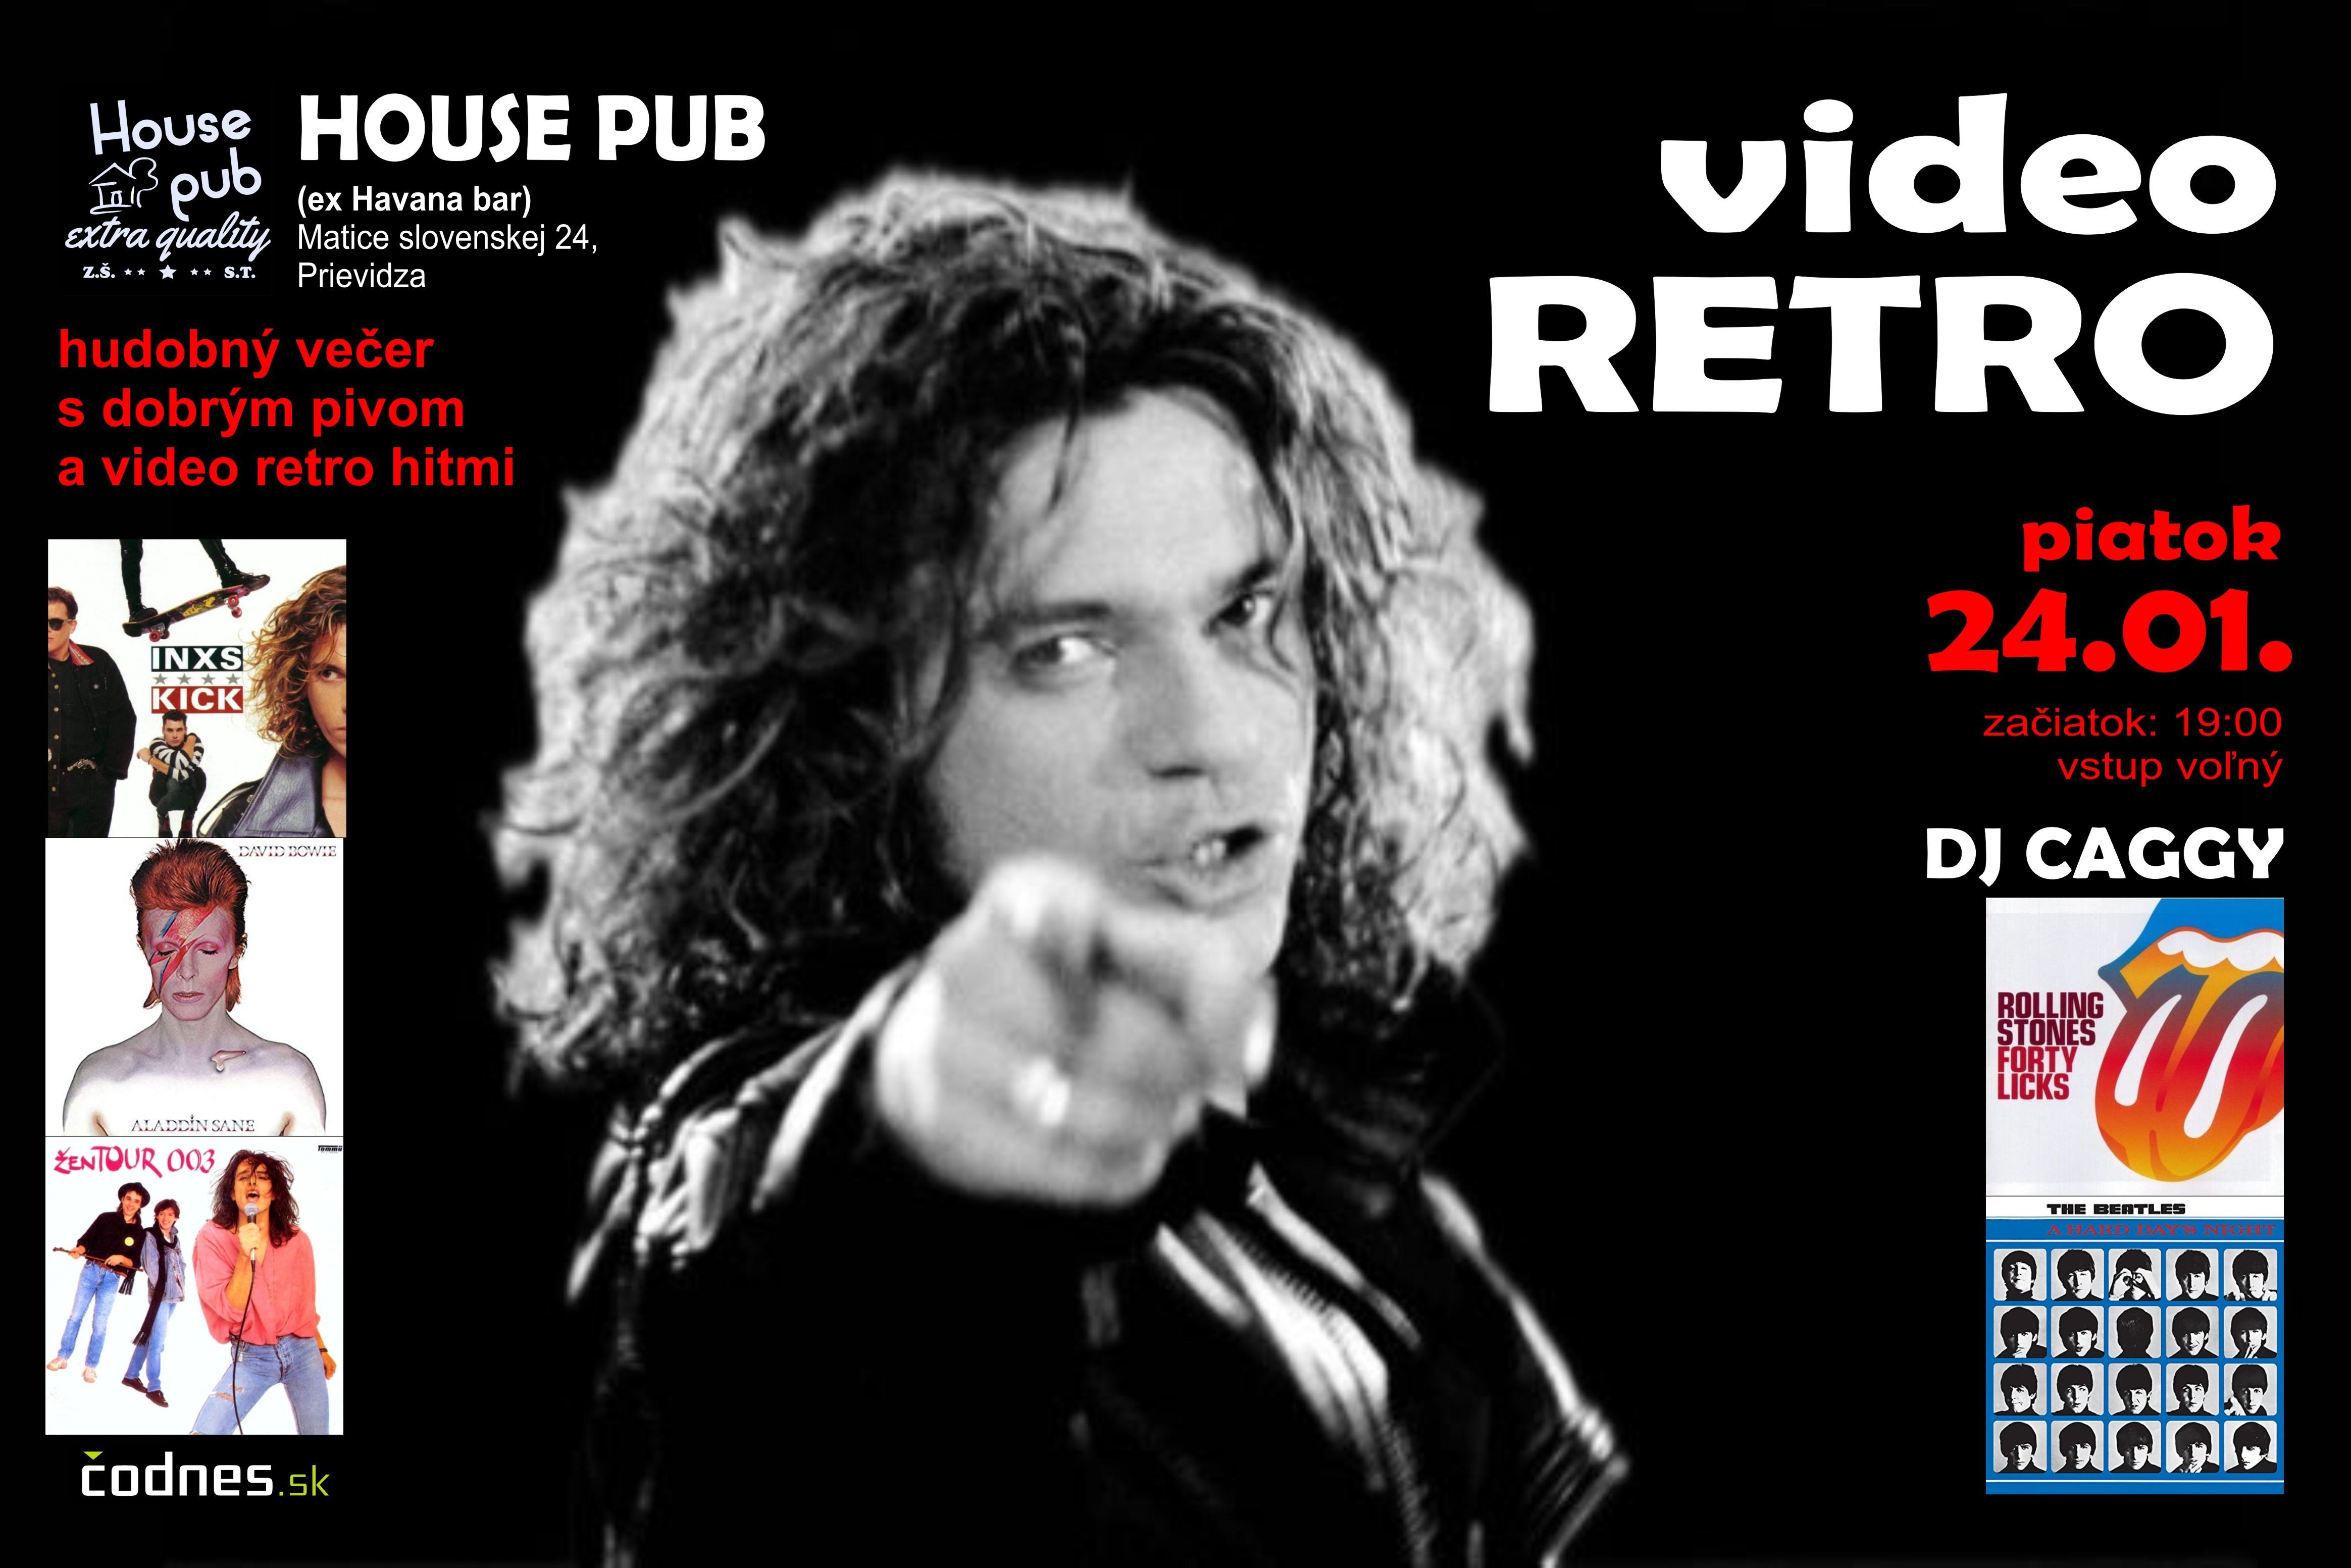 VIDEO RETRO (DJ Caggy/House Pub)